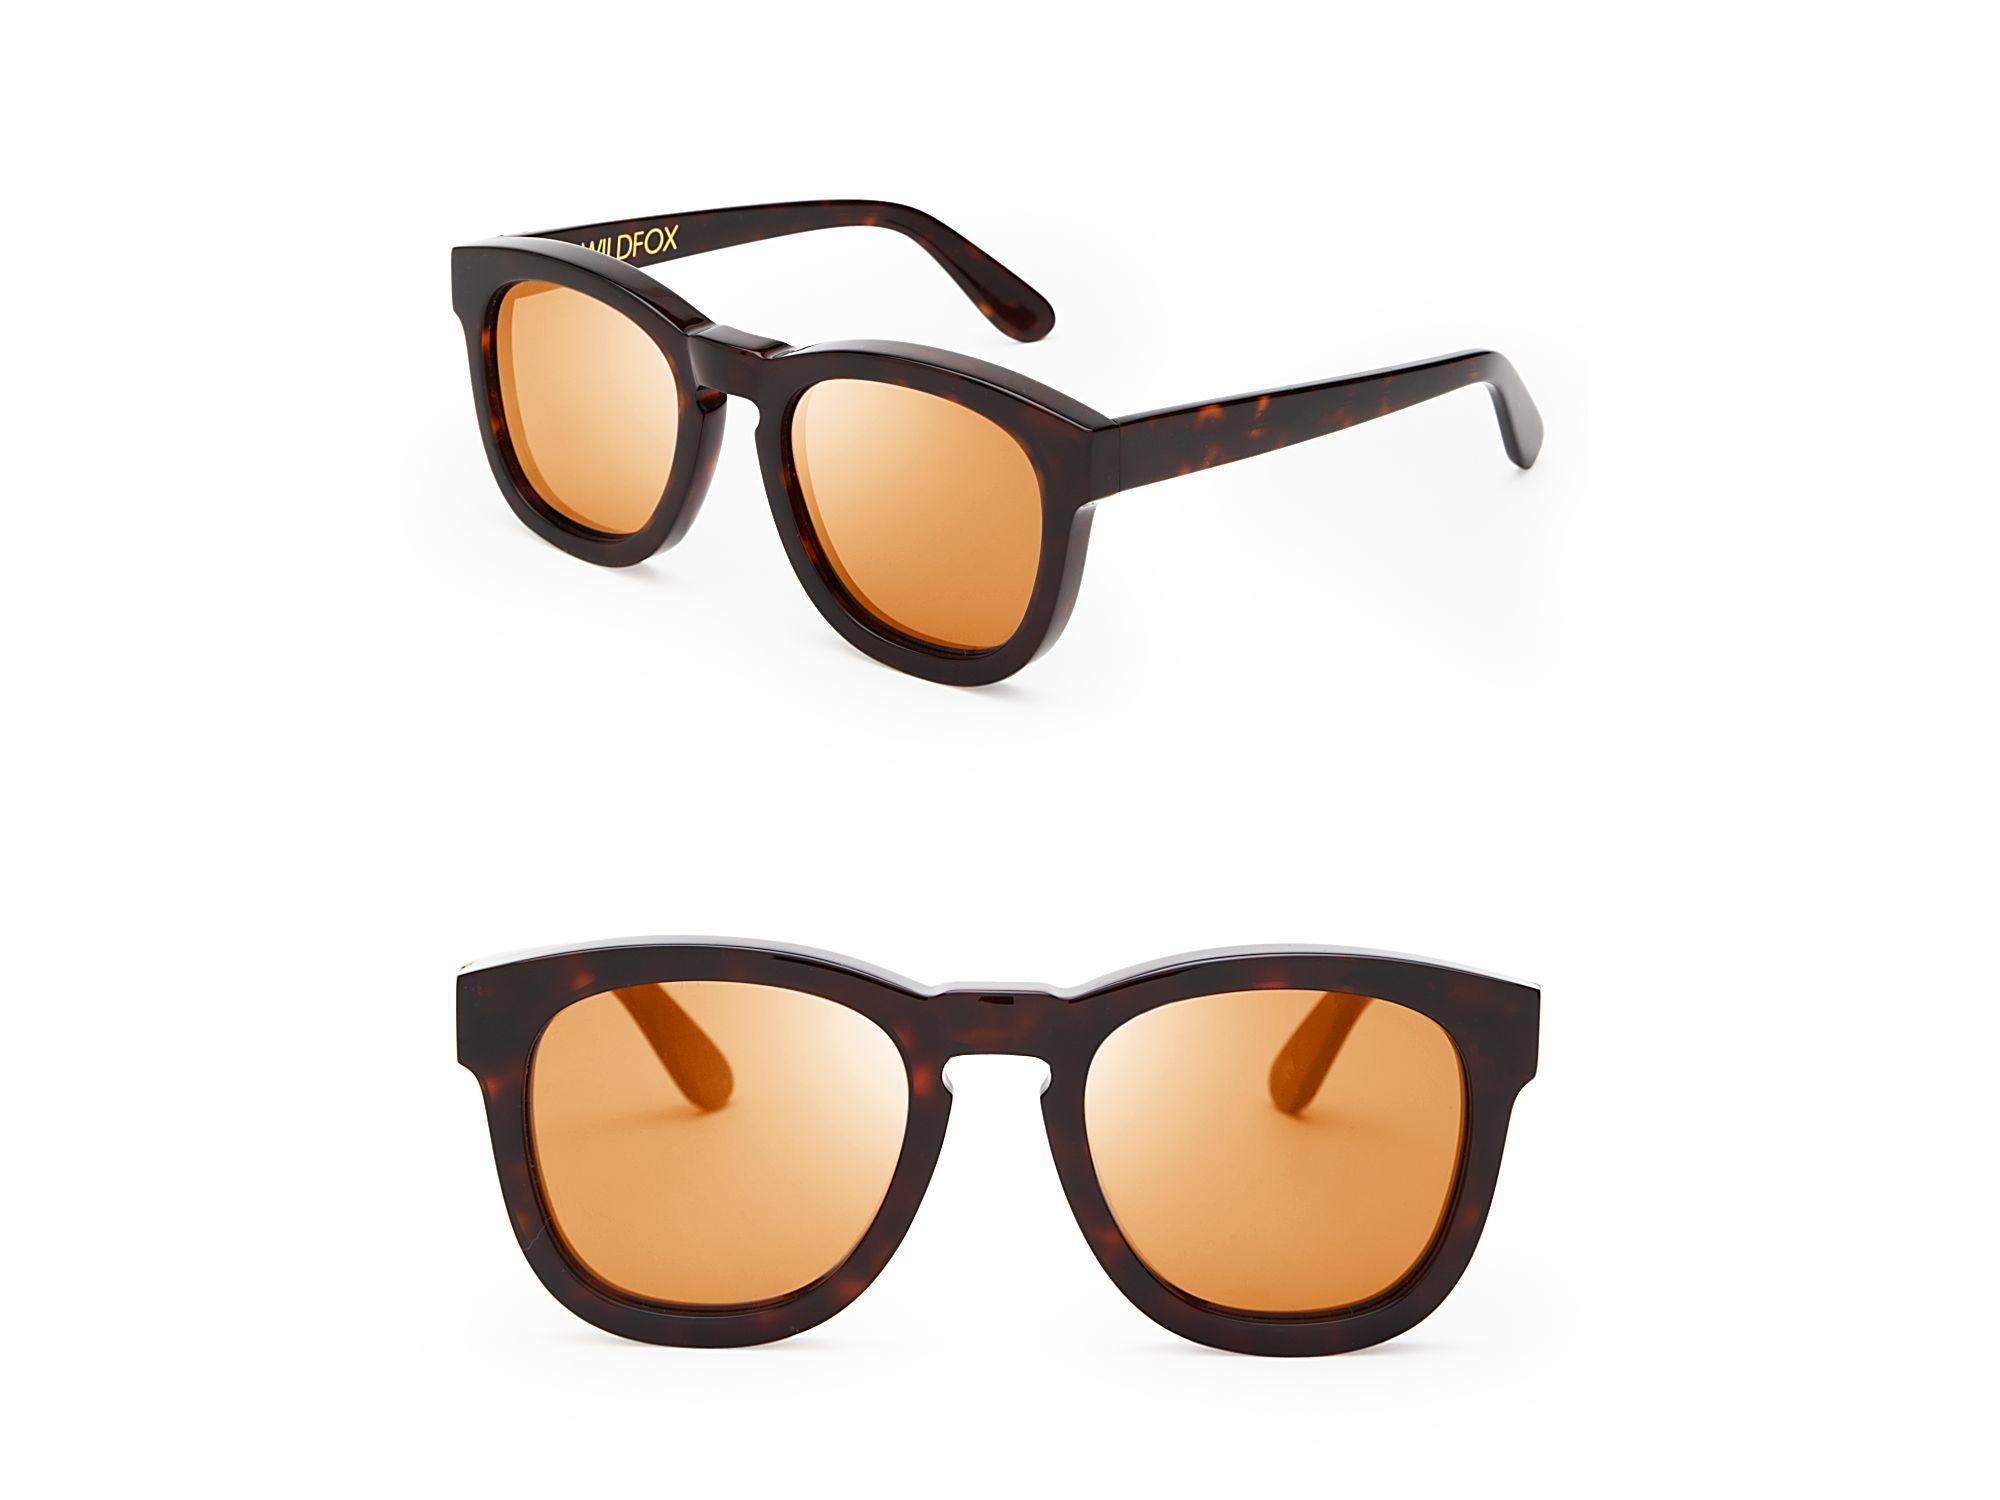 1926ce081be52 Wildfox Sunglasses